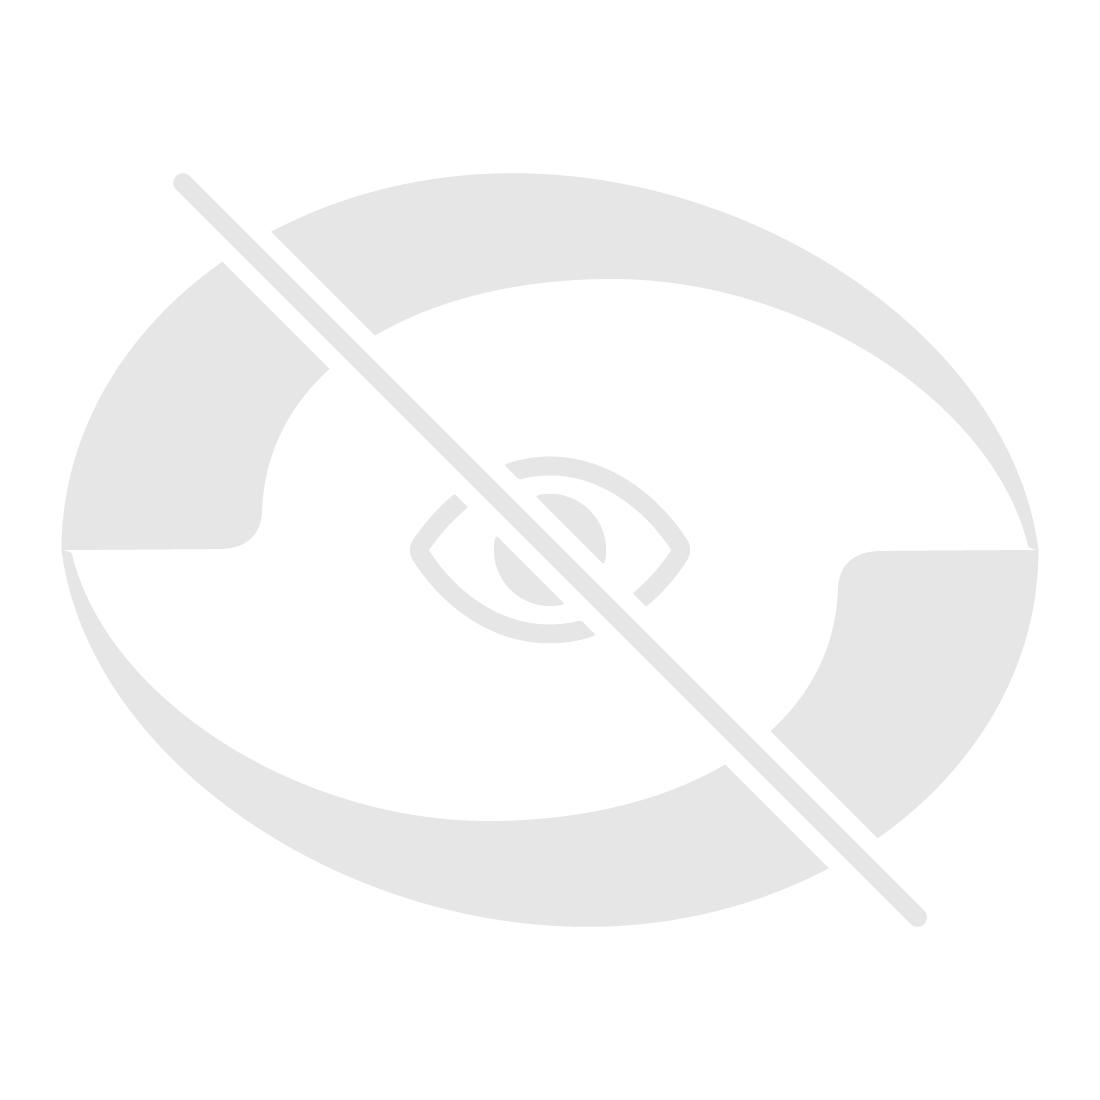 GeoVision GV-600B-16 • 16 channel hybrid video capture card